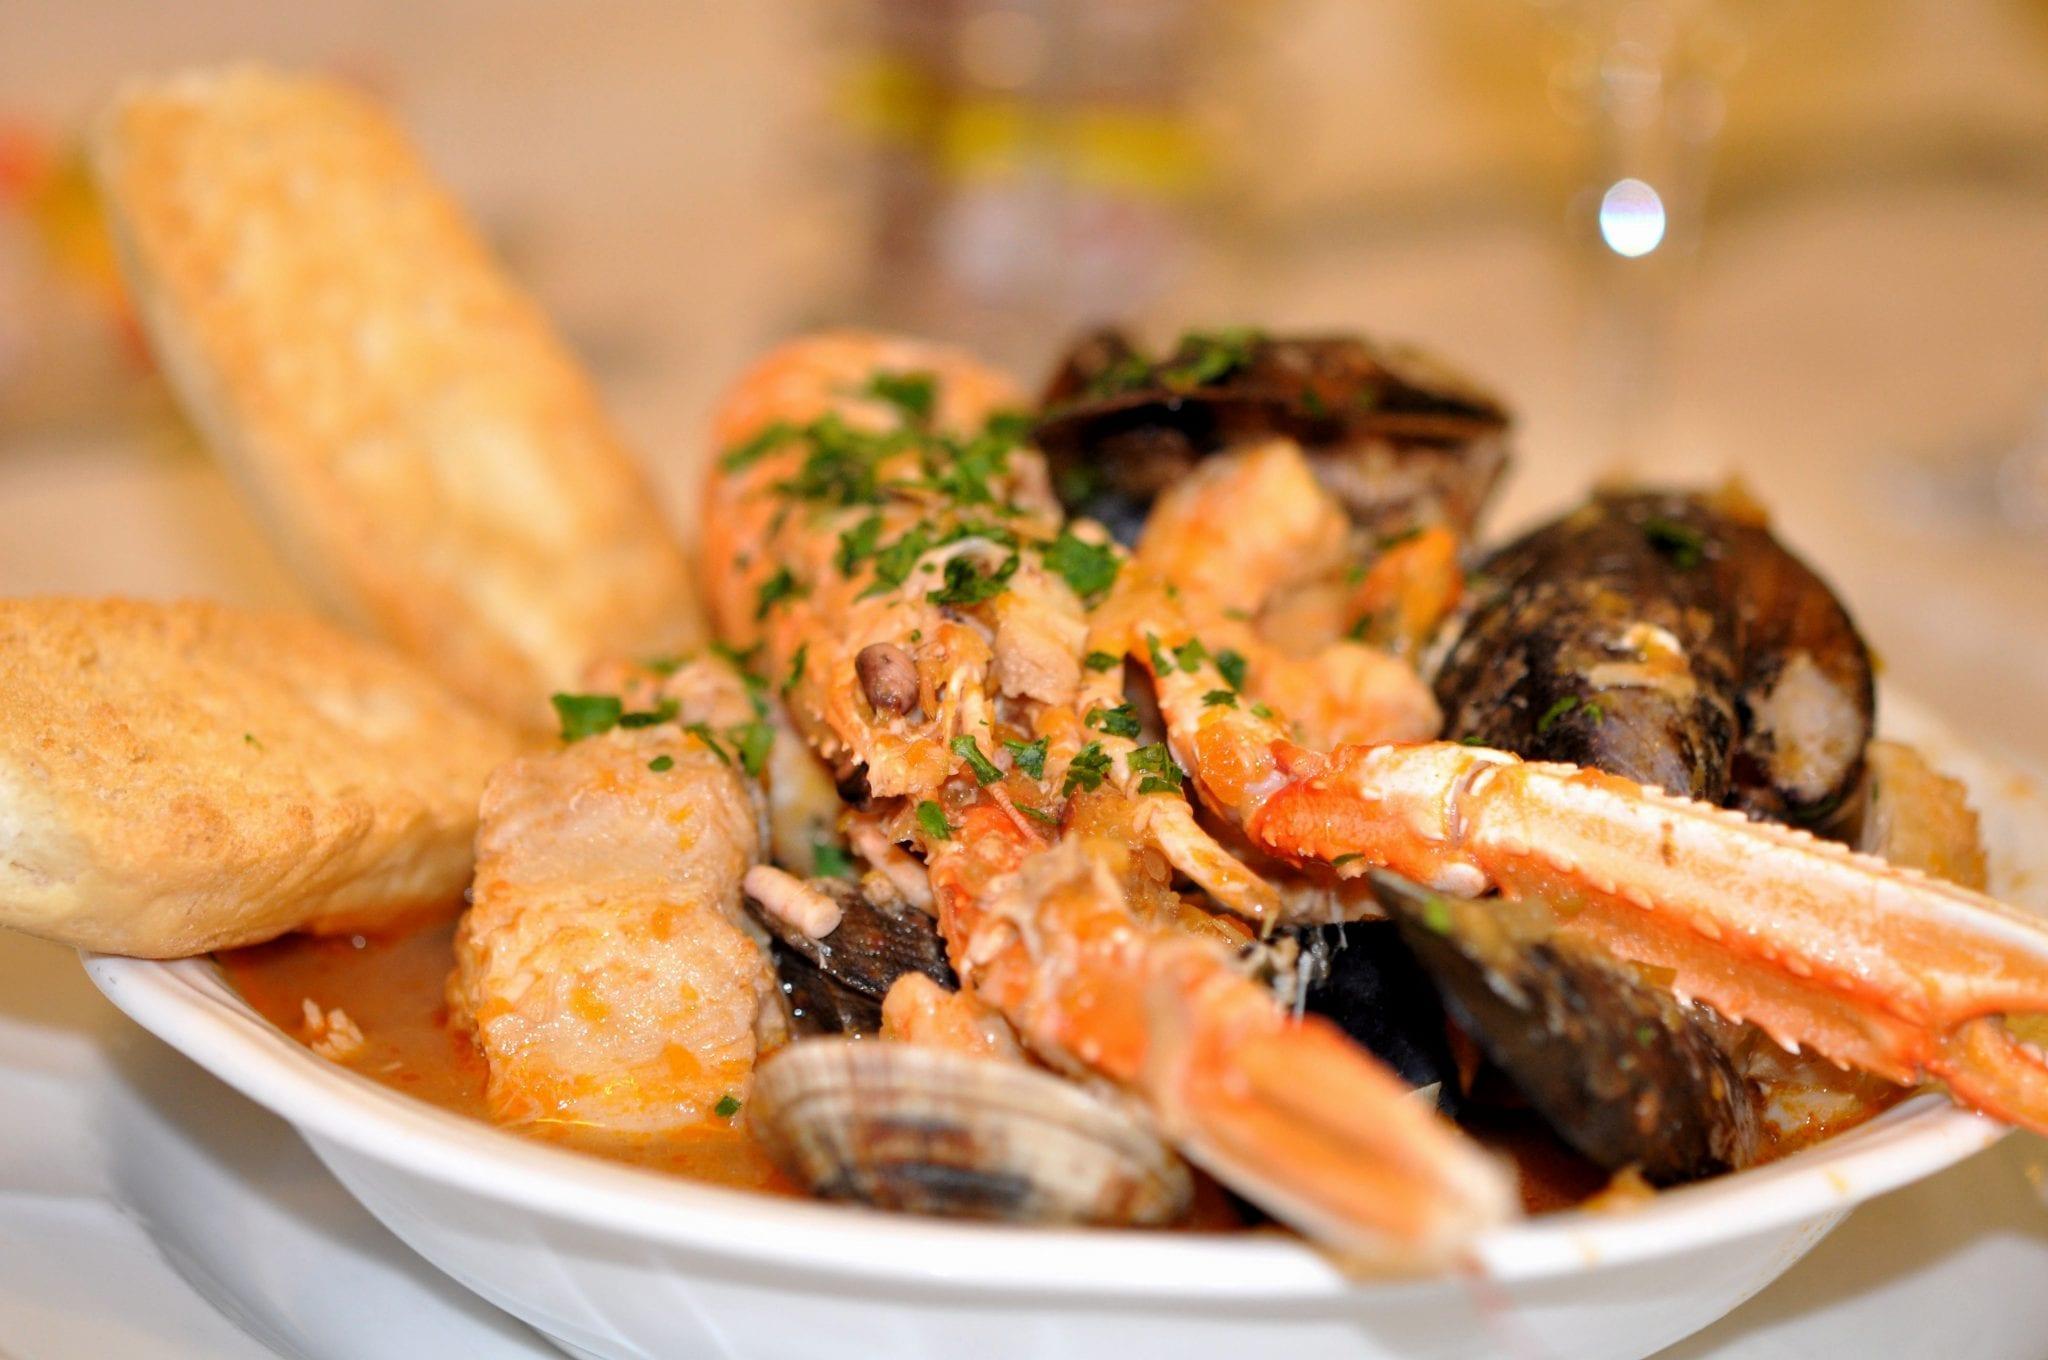 Seafood at a Venetian restaurant